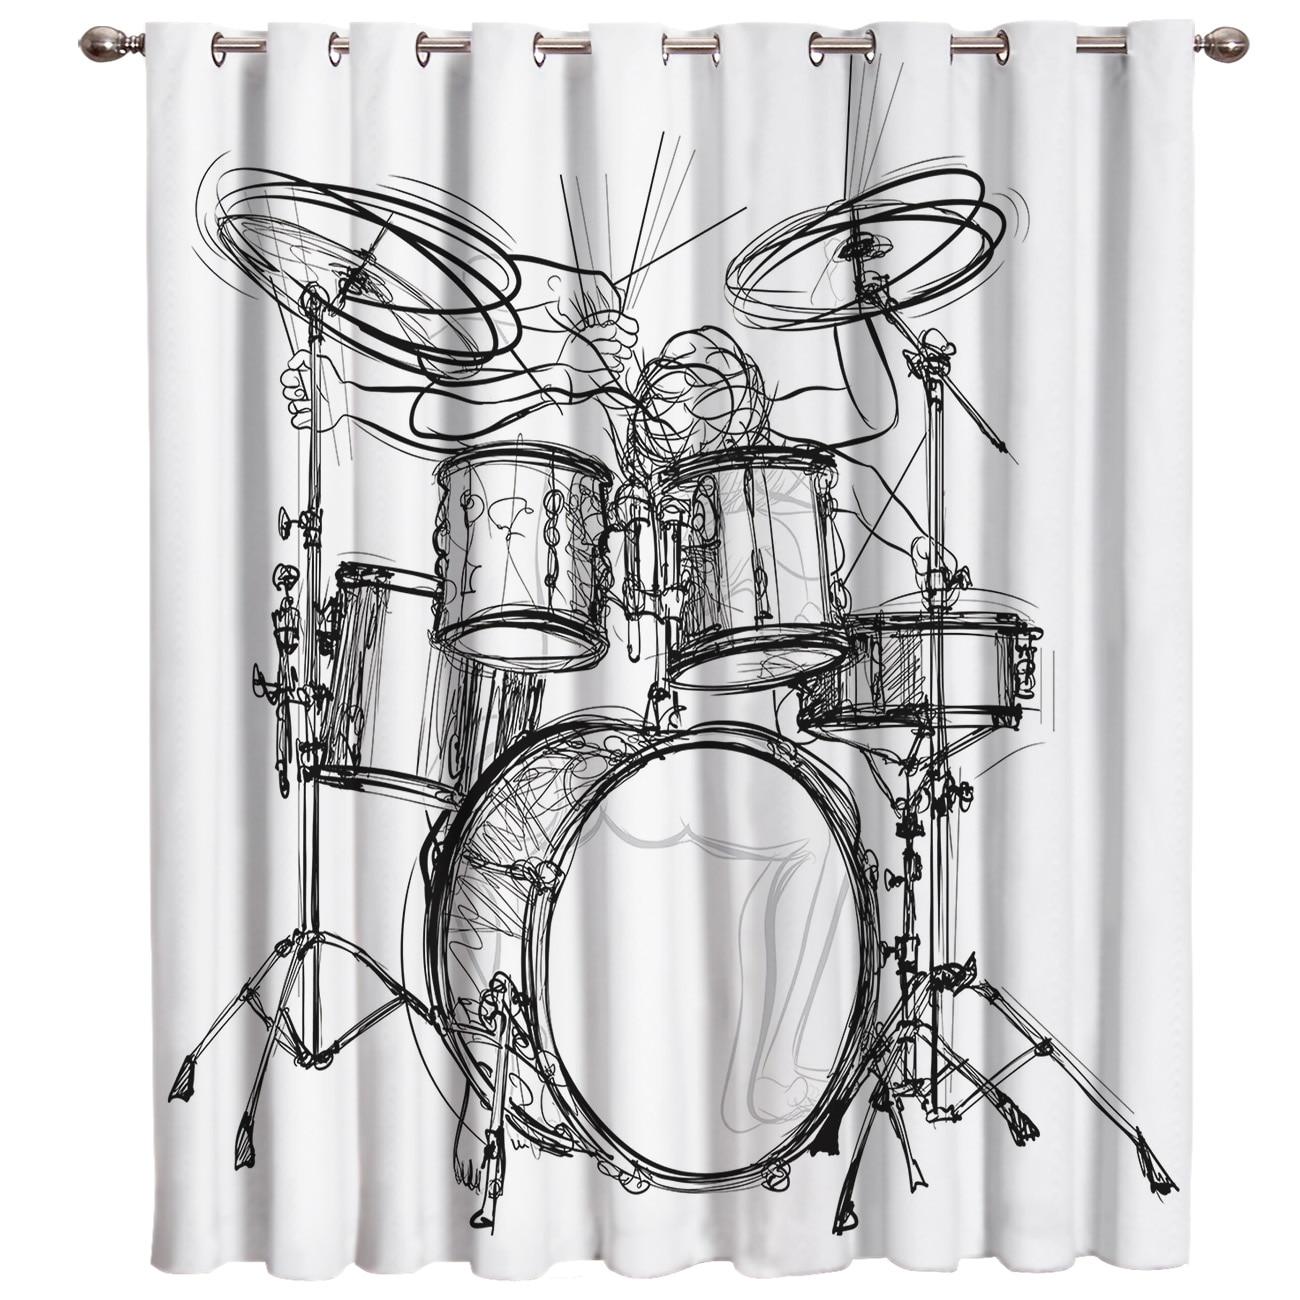 Shelf Drum Rock Music Blackout Kitchen Outdoor Bedroom Indoor Decor Kids Window Treatment Hardware Sets Curtain Panels With